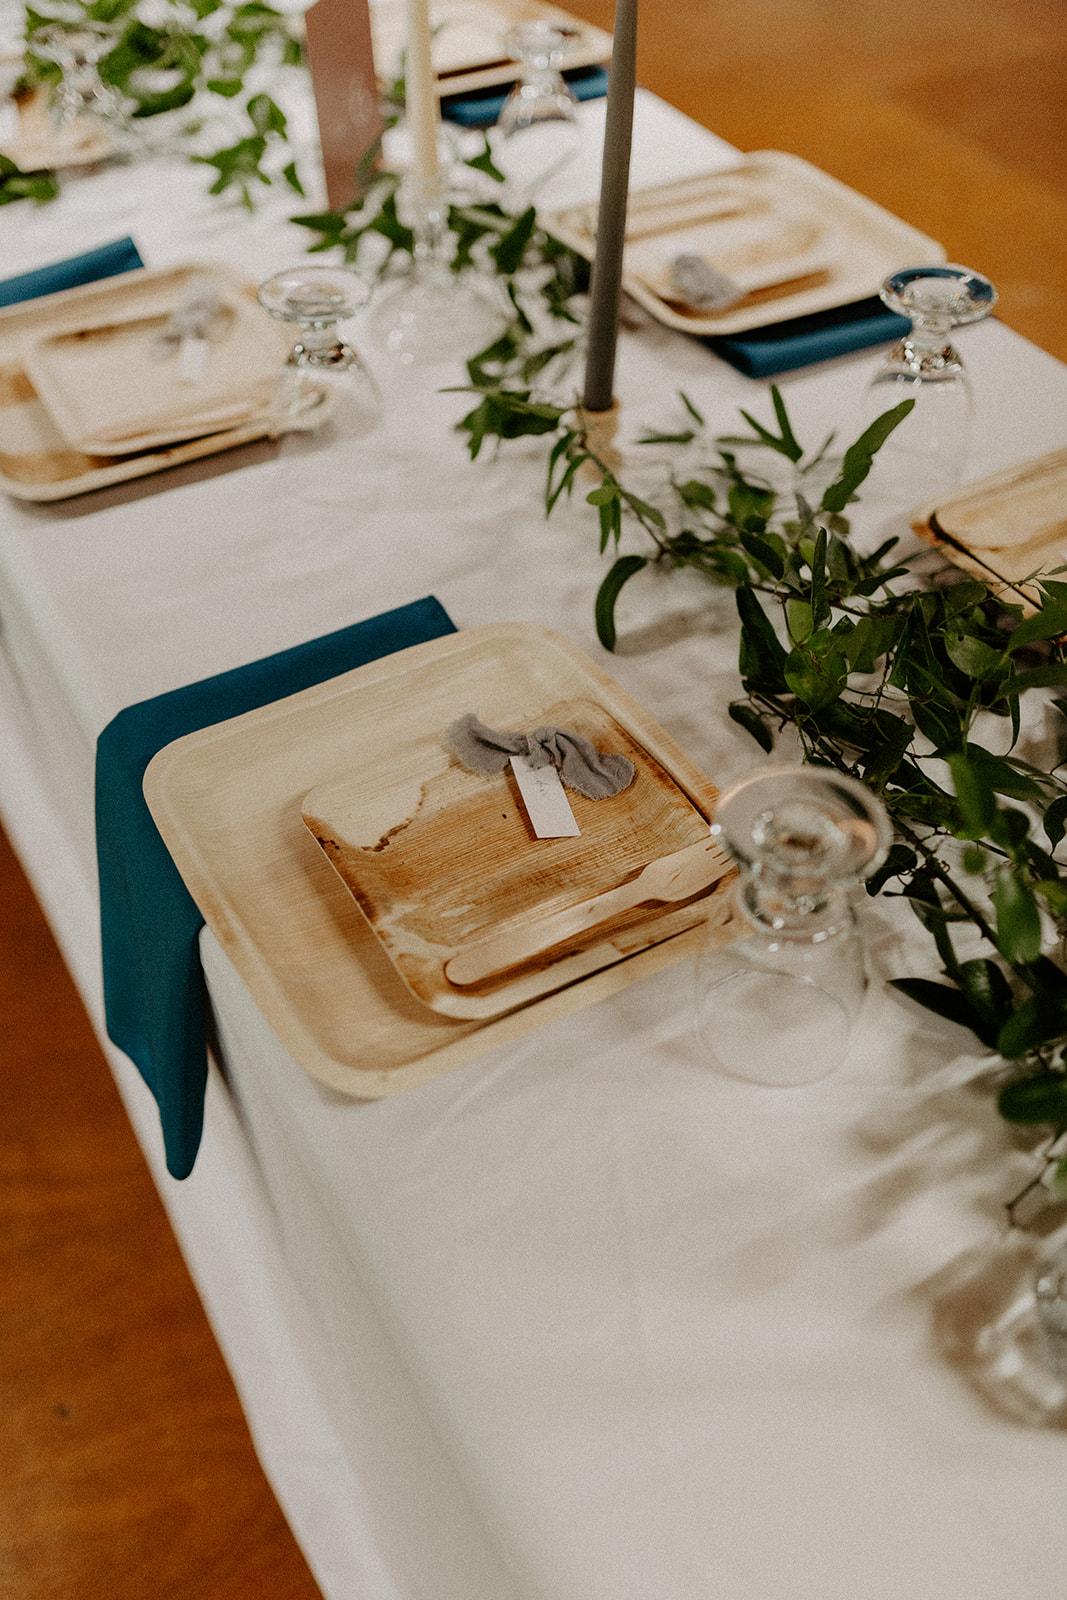 camp_wokanda_peoria_illinois_wedding_photographer_wright_photographs_bliese_0845.jpg